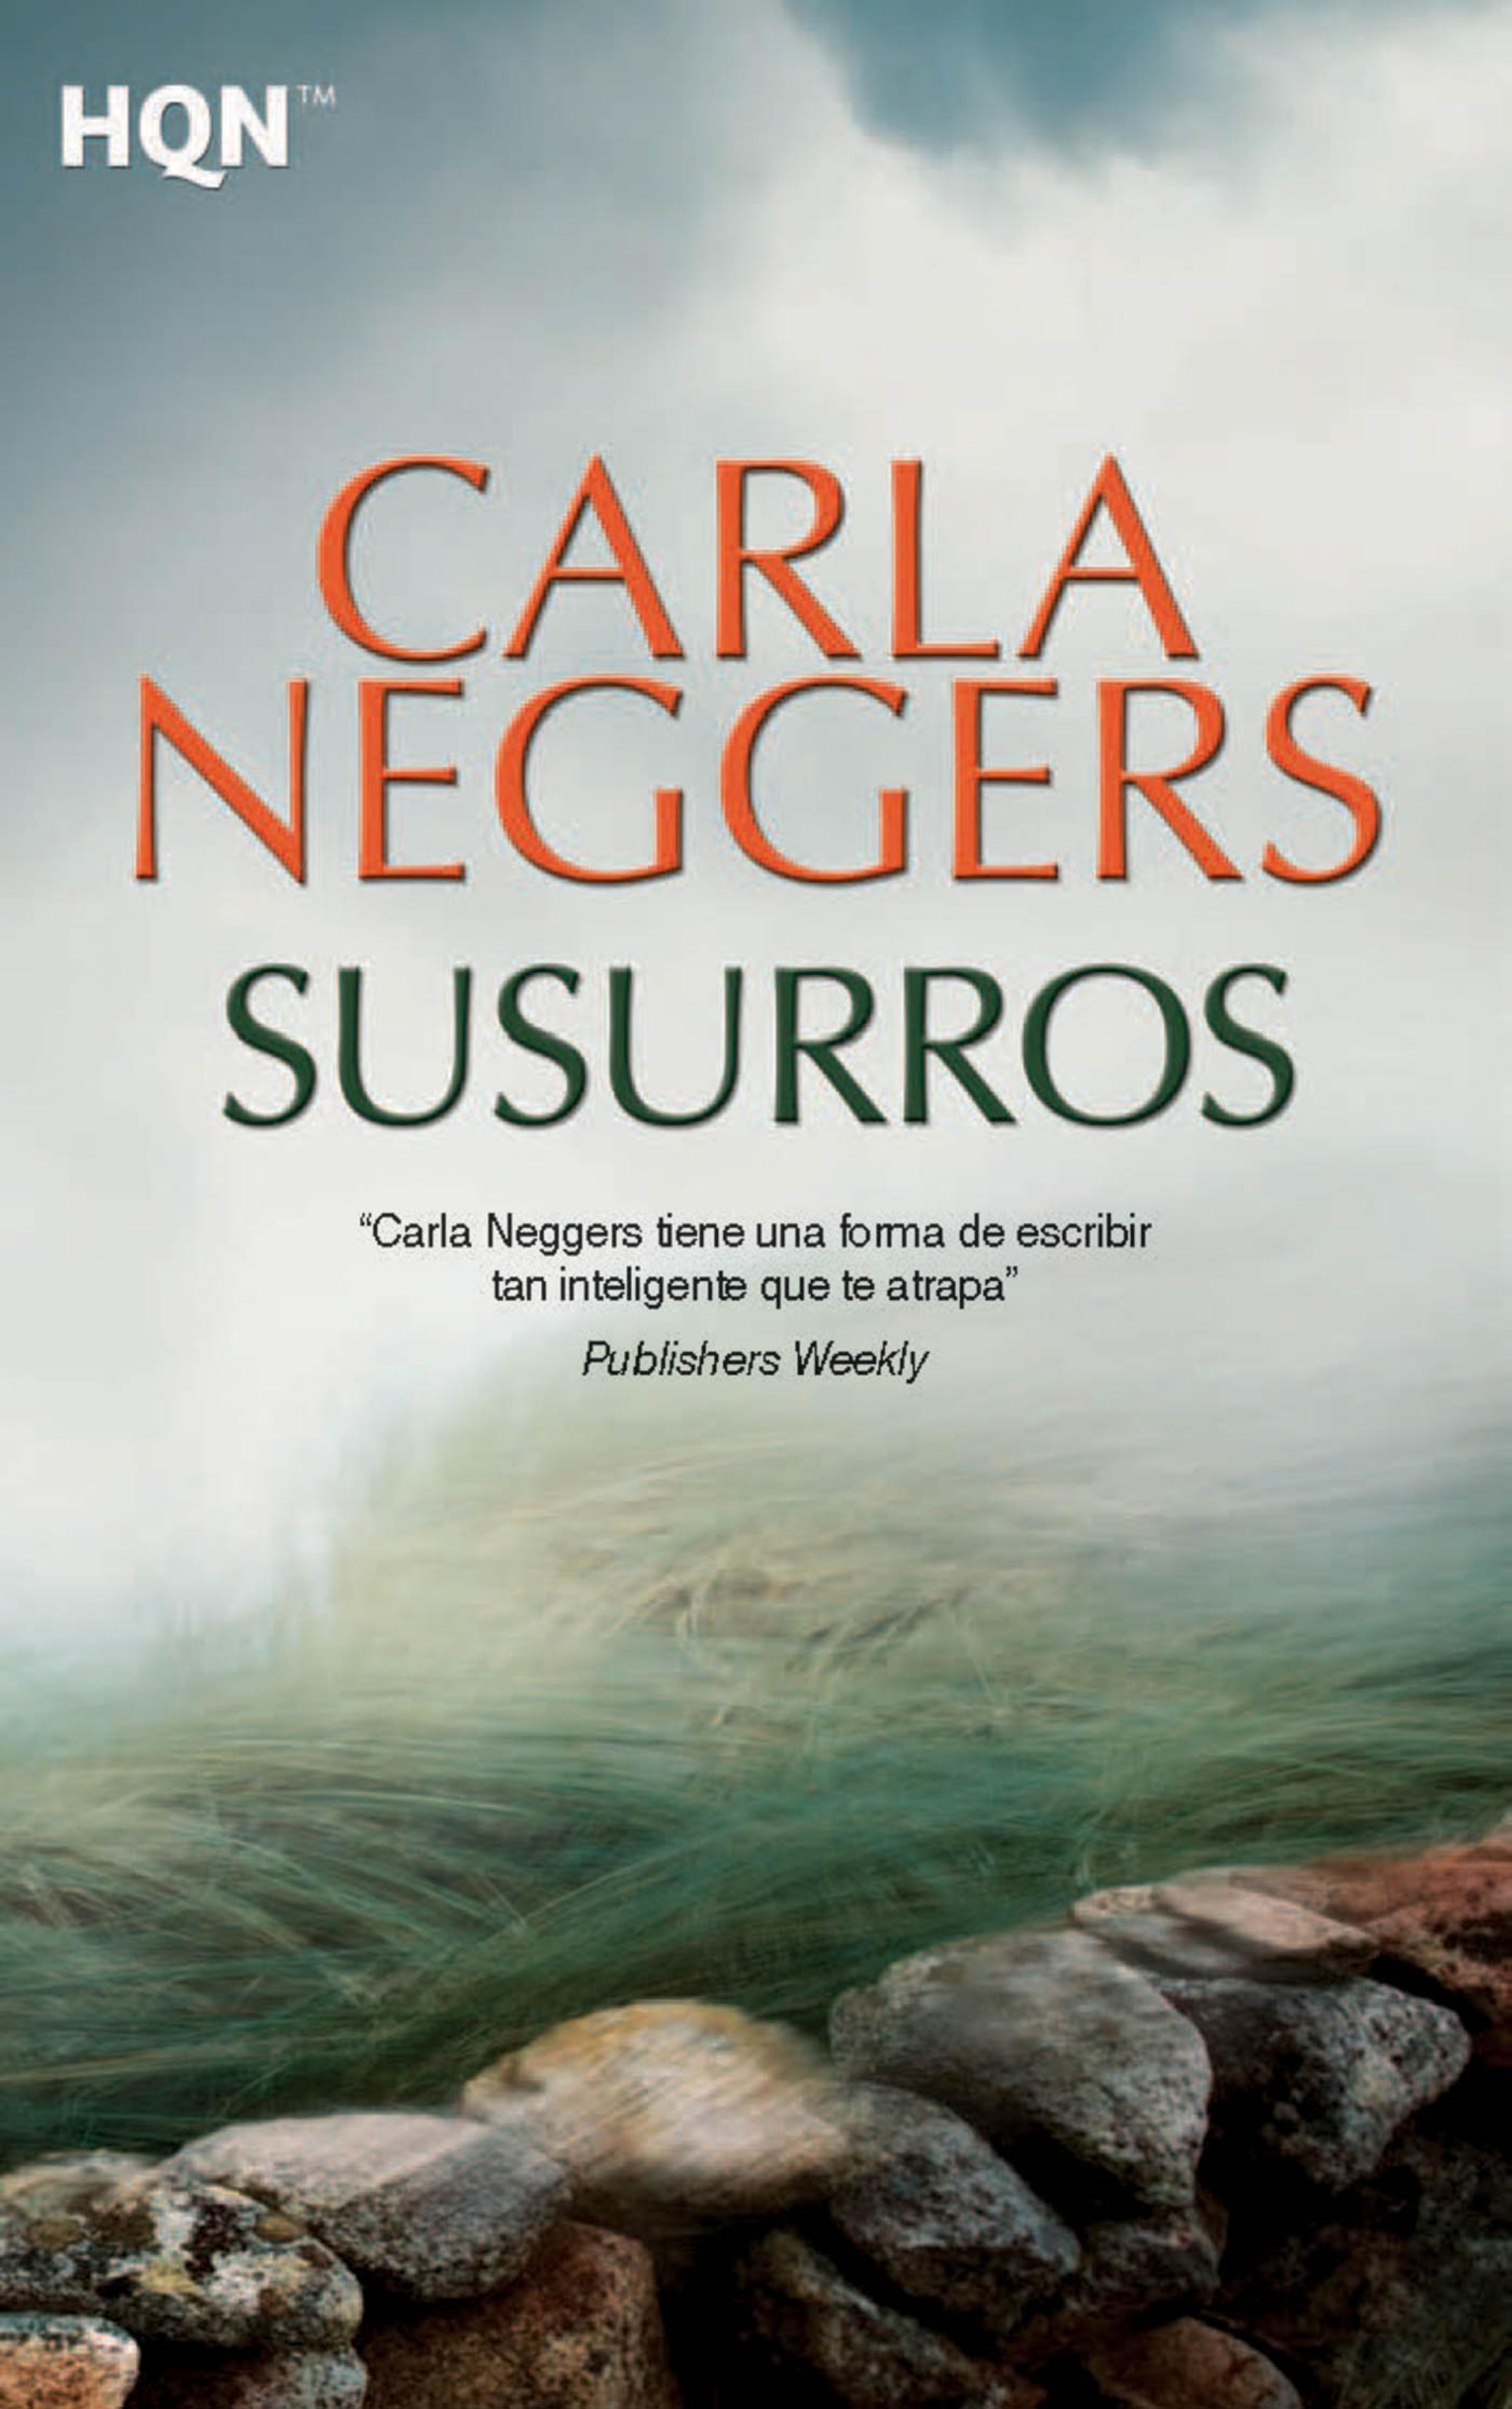 Carla Neggers Susurros